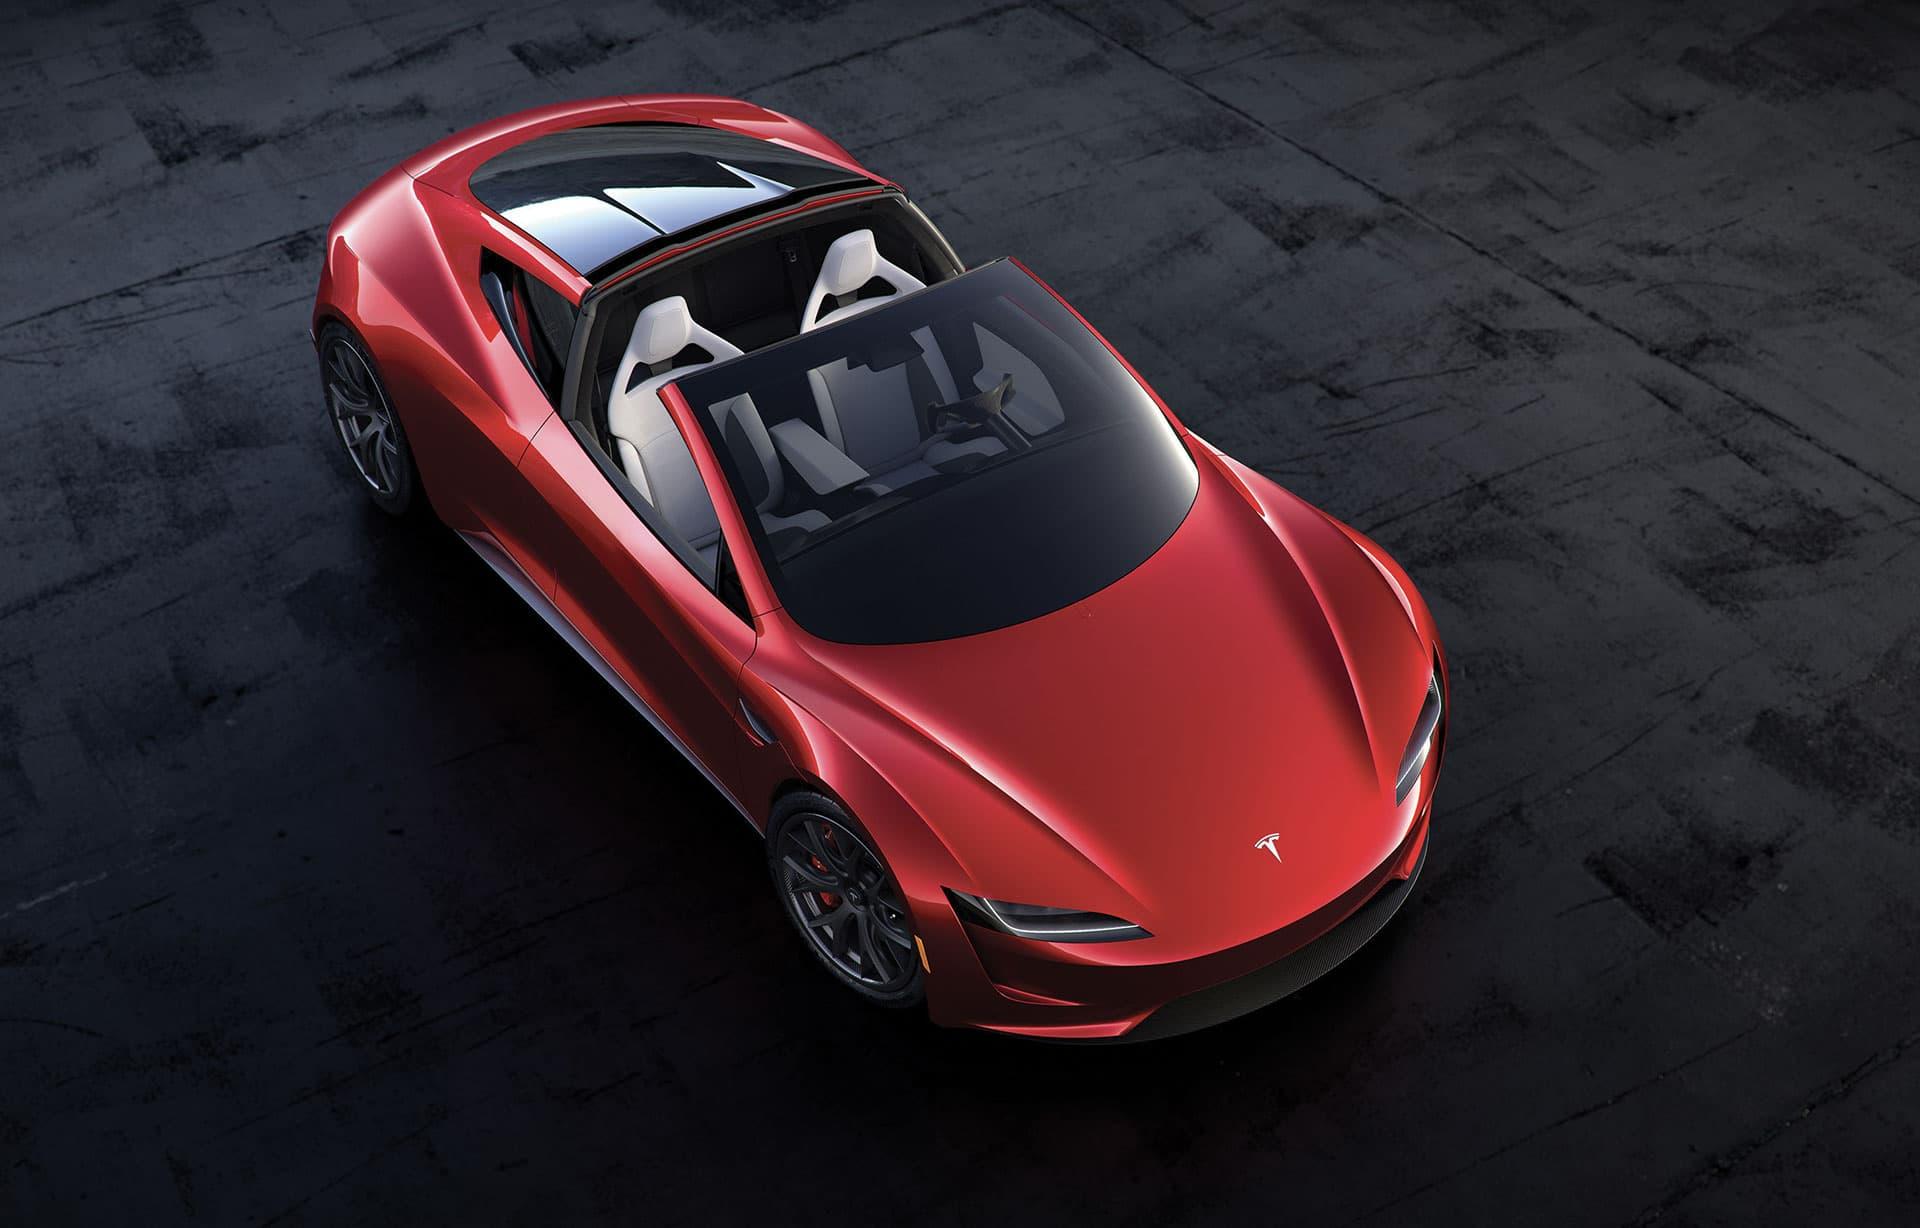 Tesla Roadster 2022 Numeri da capogiro: un missile da 0-100 in 1,1 secondi!